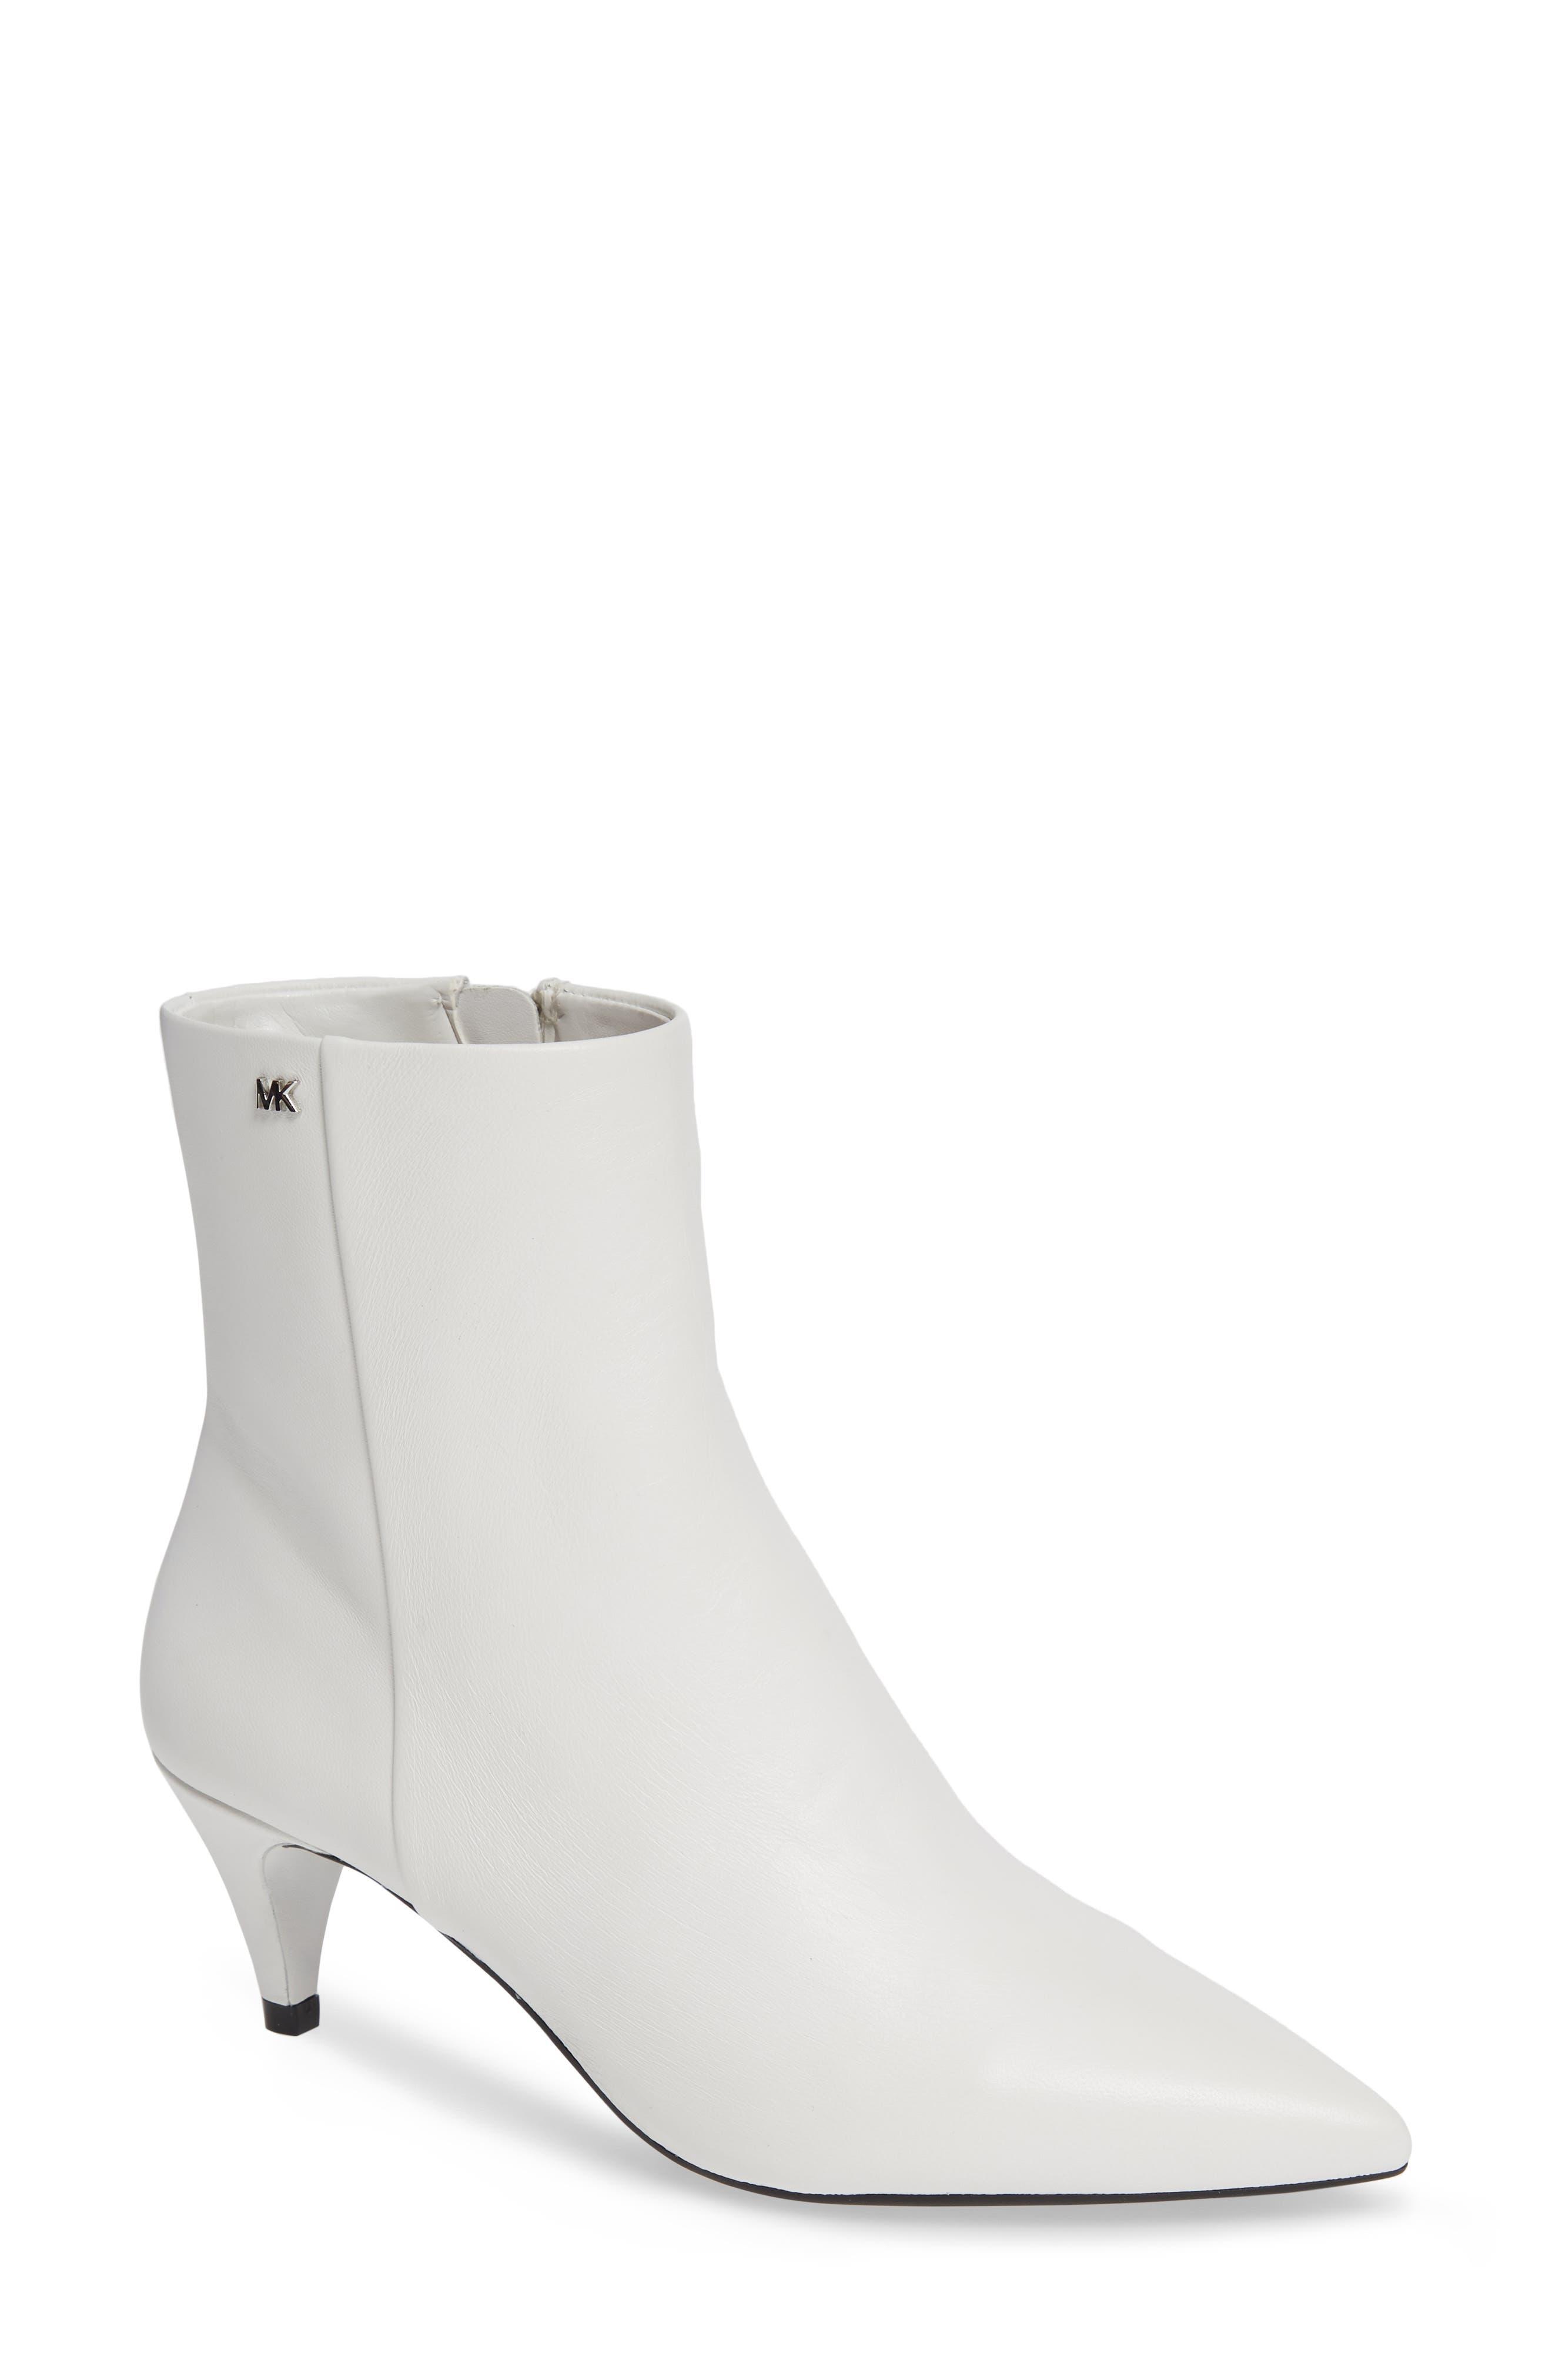 Michael Michael Kors Blaine Kitten Heel Bootie, White